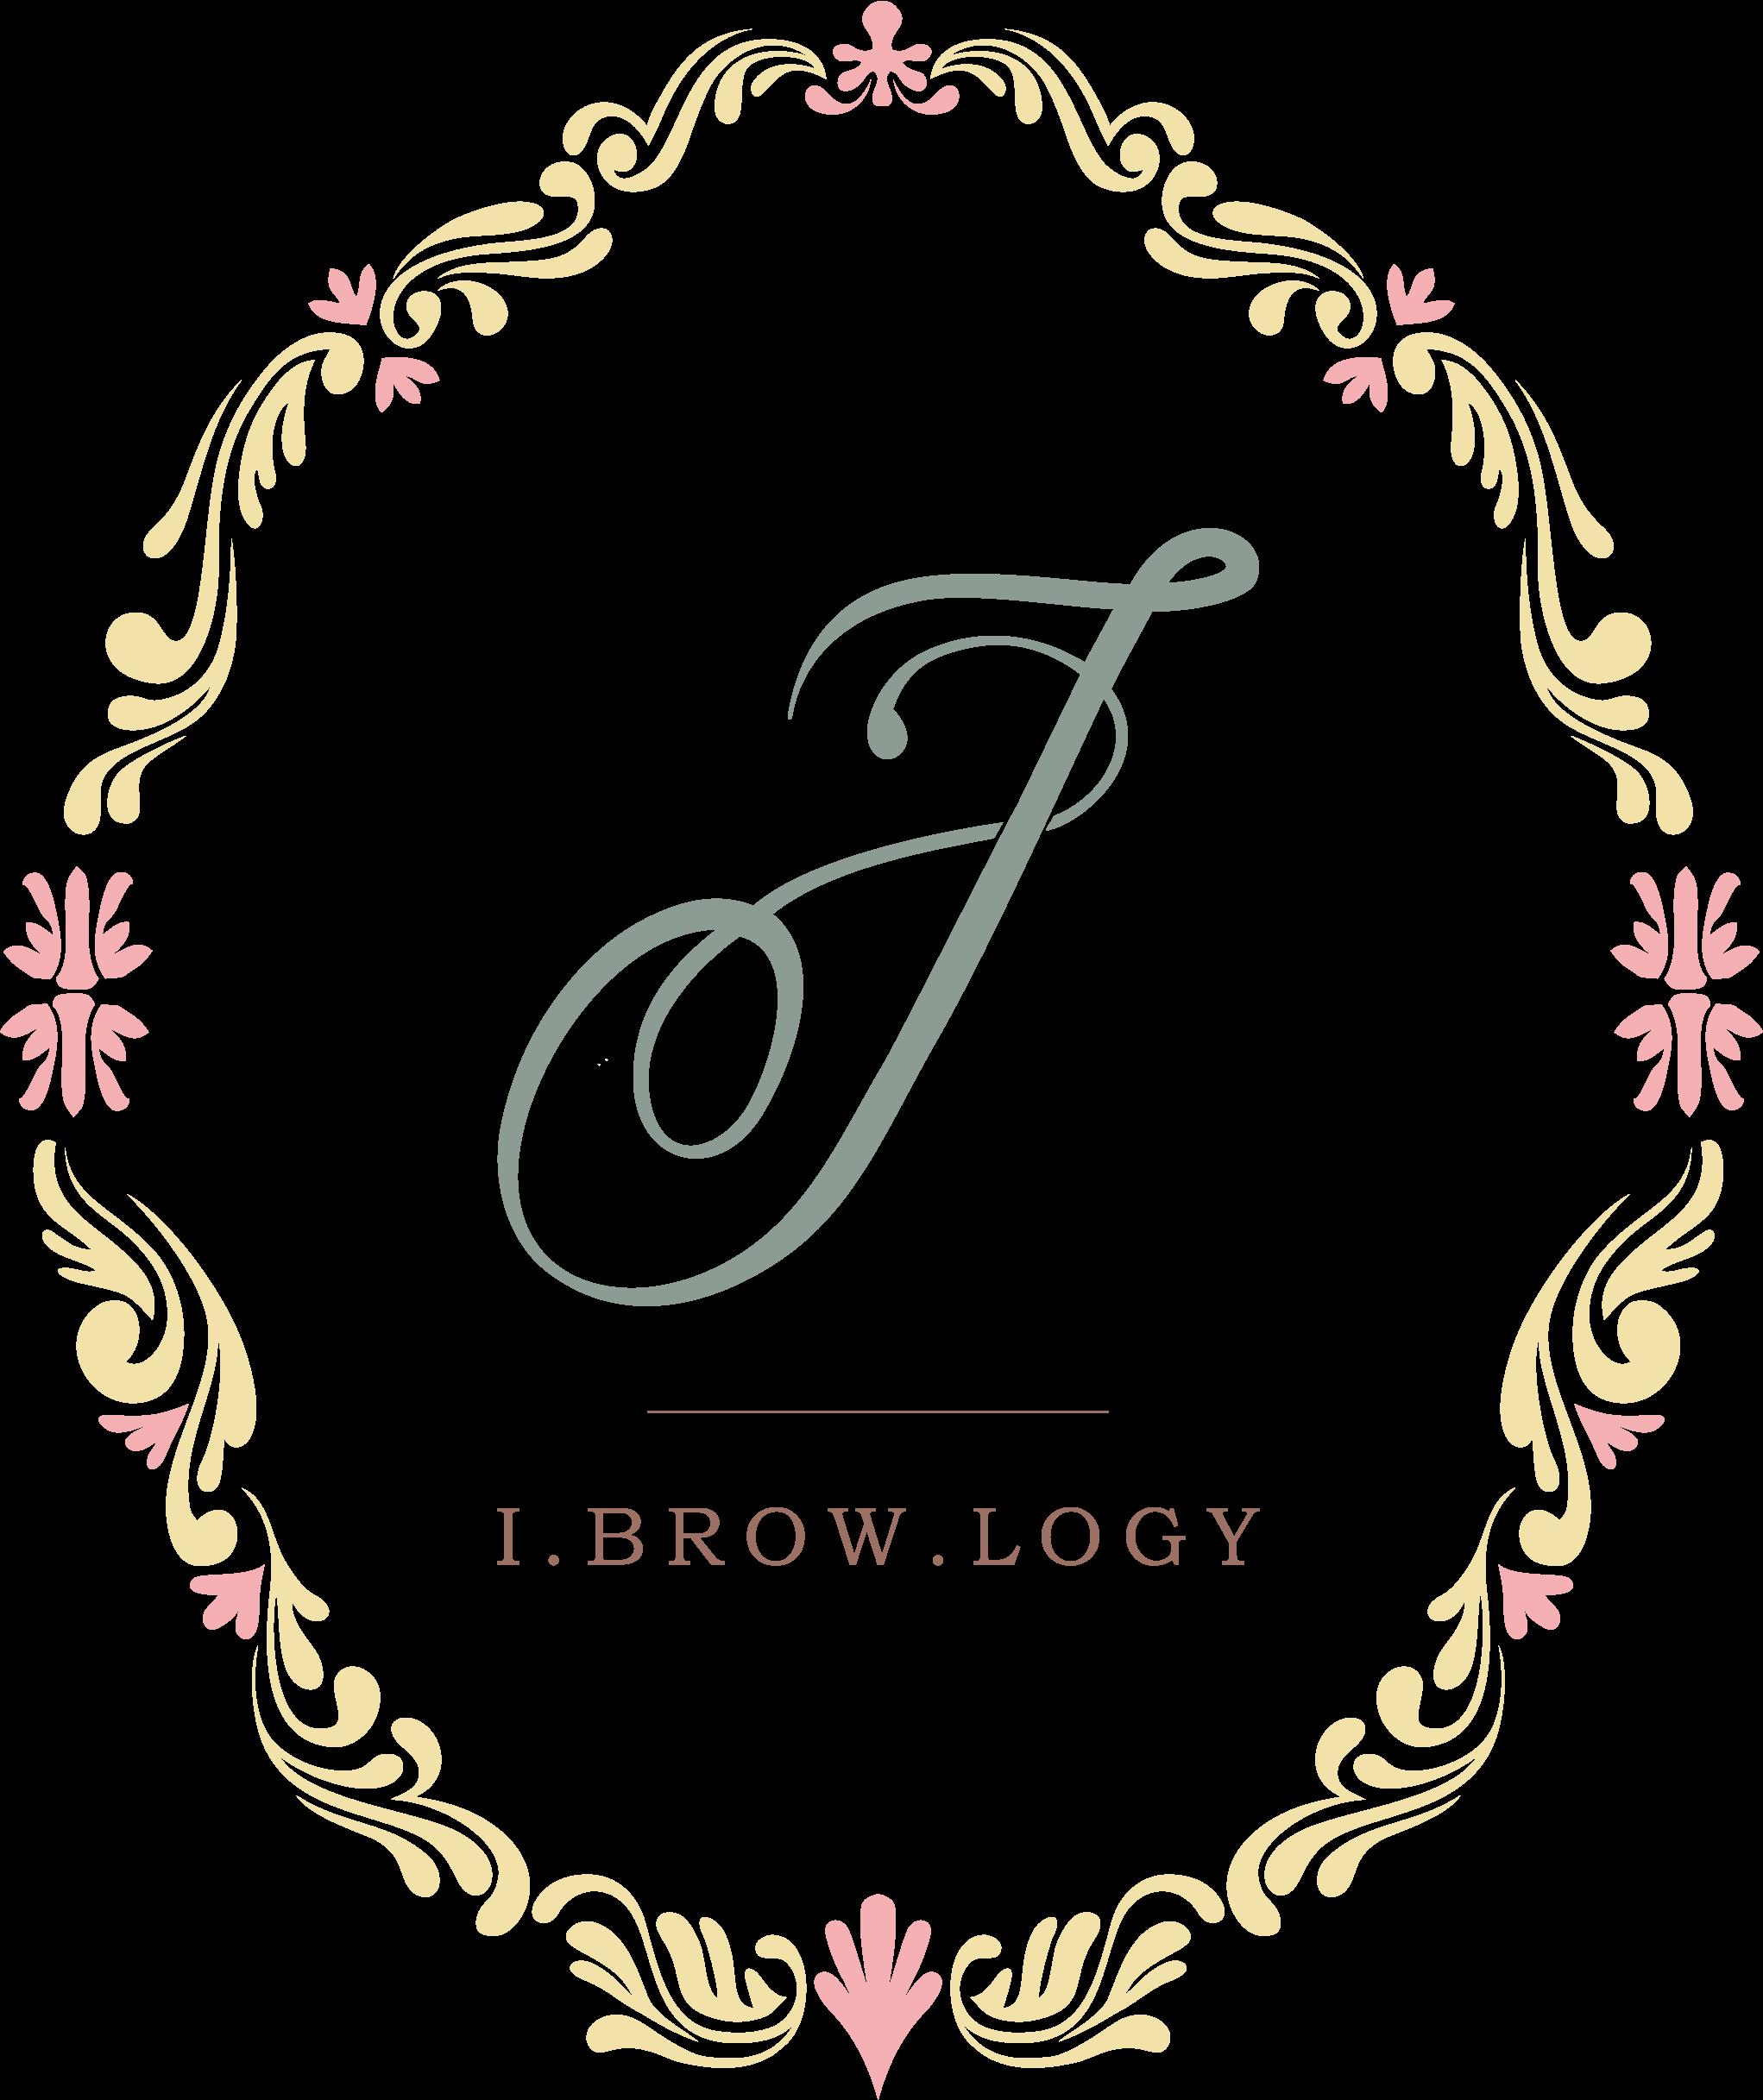 I.BROW.LOGY